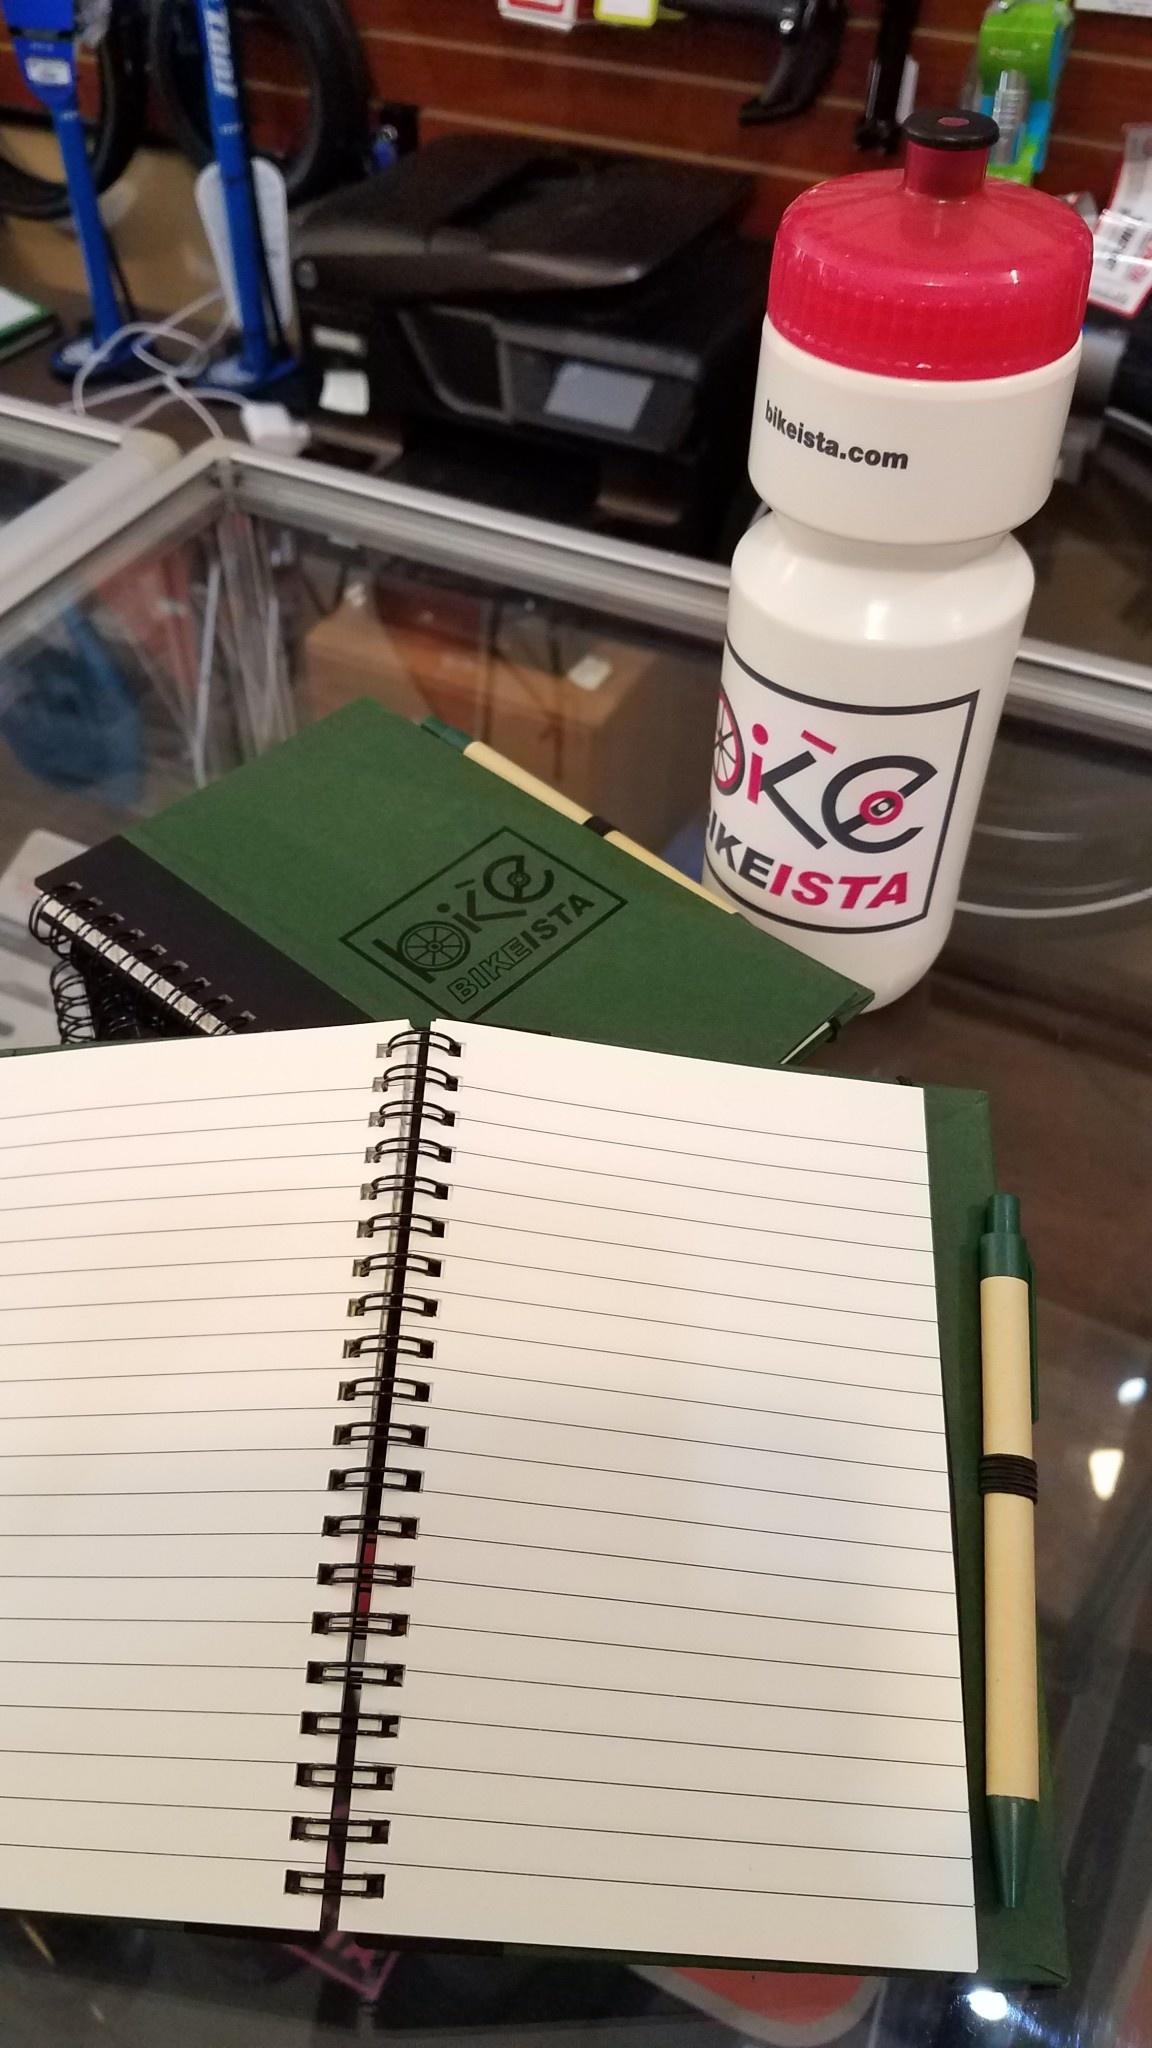 BikeIsta BIKEISTA Notebook